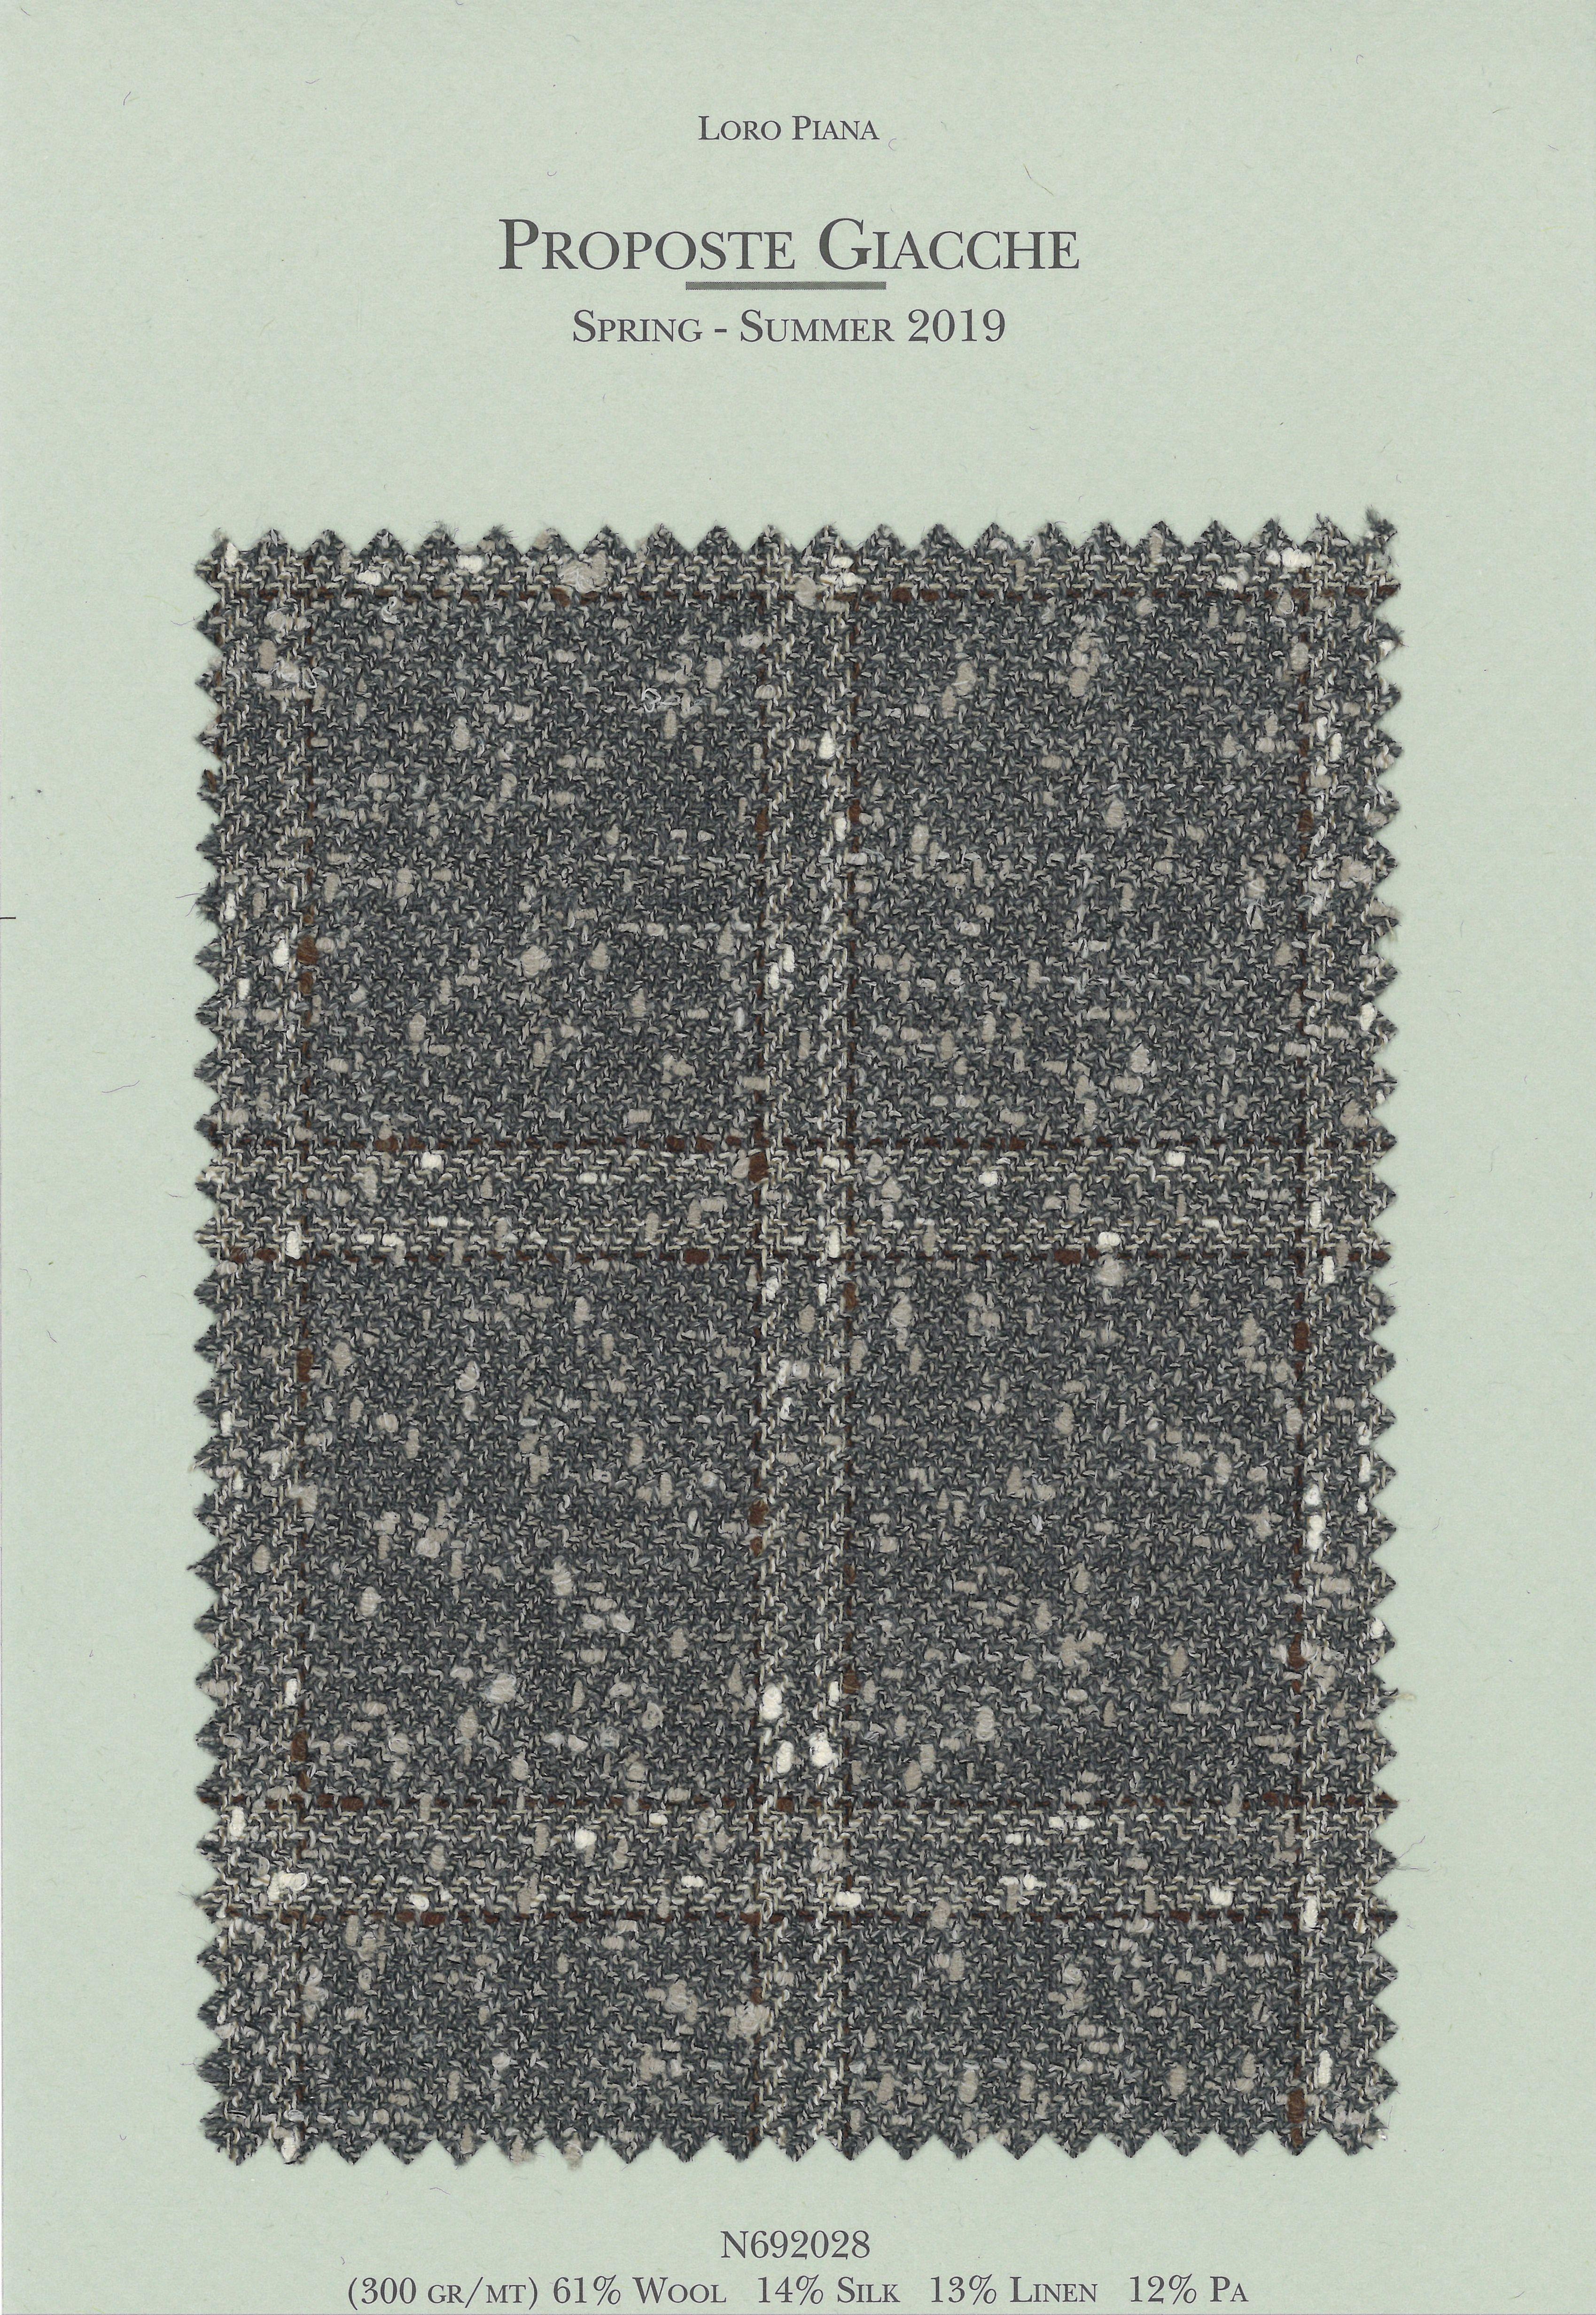 N692028